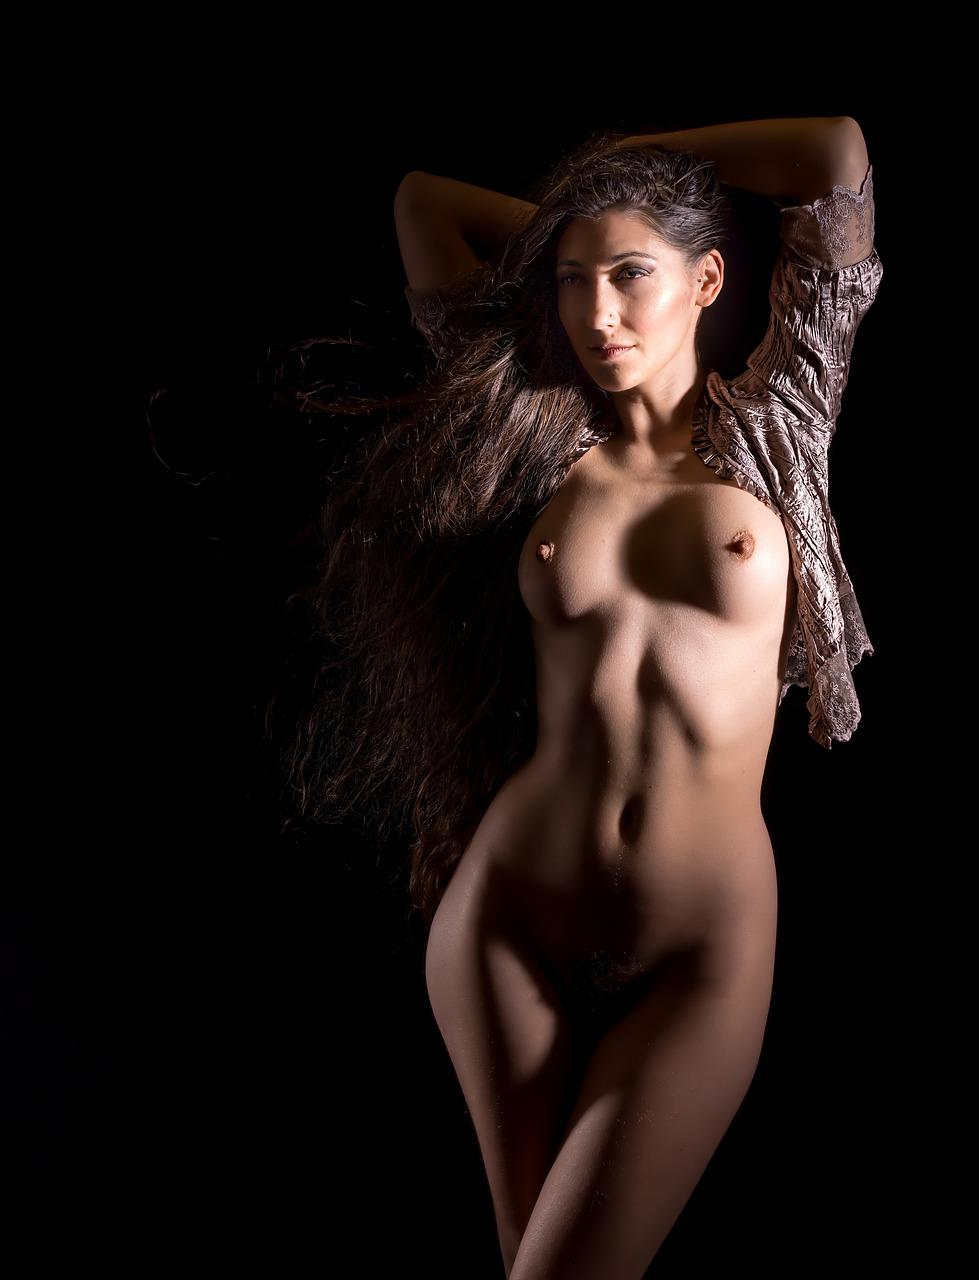 Nude ero Erotica Nude